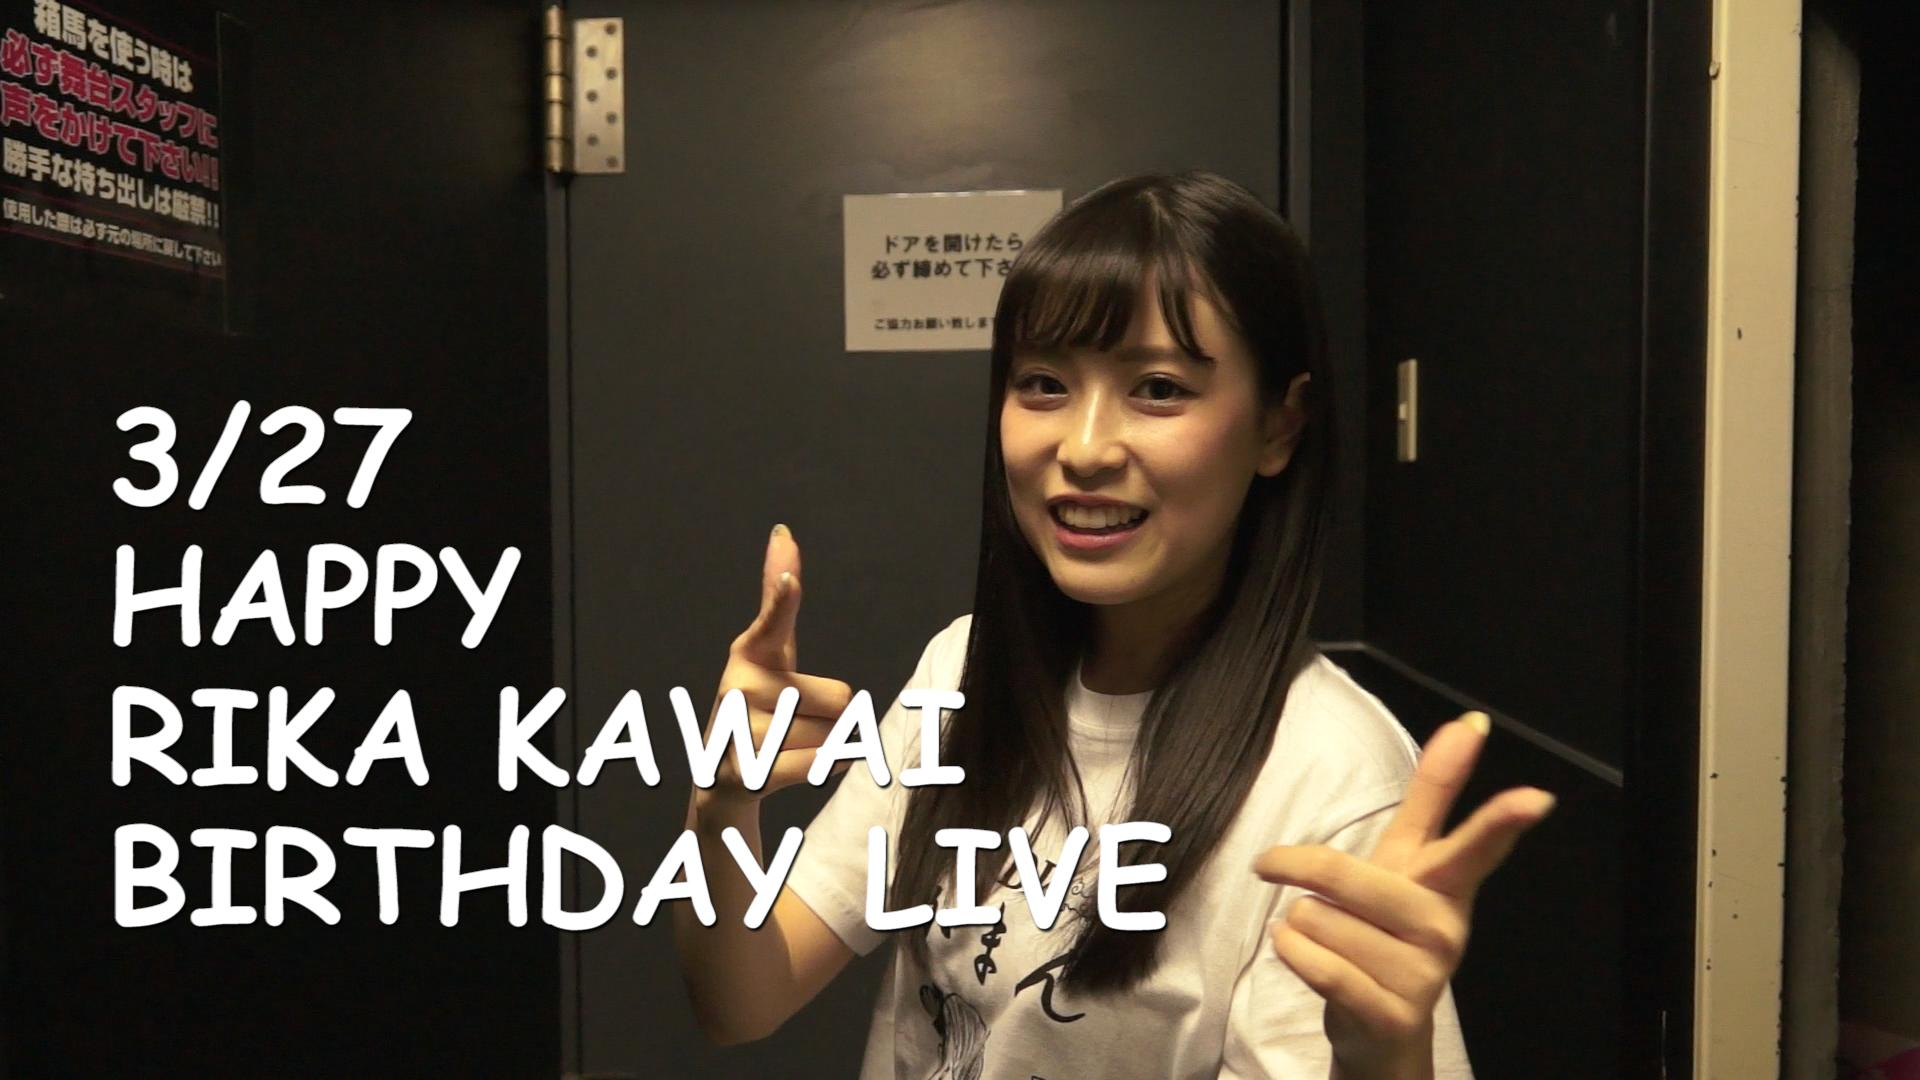 3/27 HAPPY RIKA KAWAI BIRTHDAY LIVE